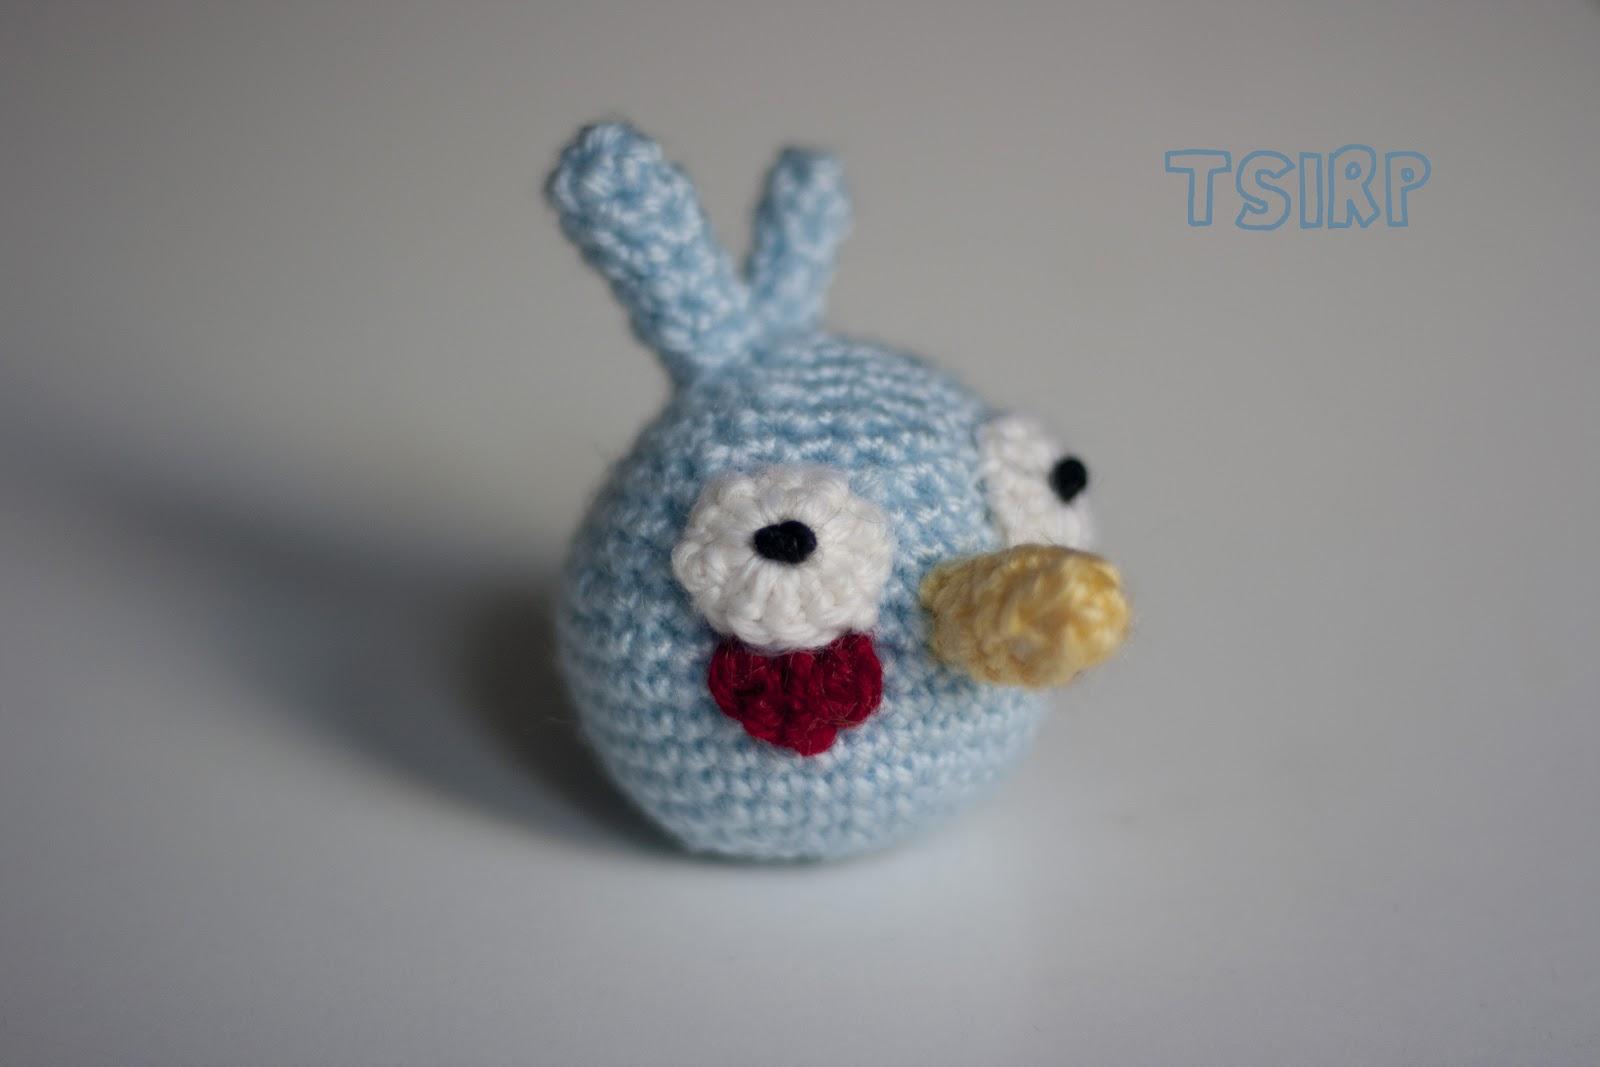 Blue Angry Bird Amigurumi Pattern : Oma ompelunurkkaus: Blue angry bird -amigurumi